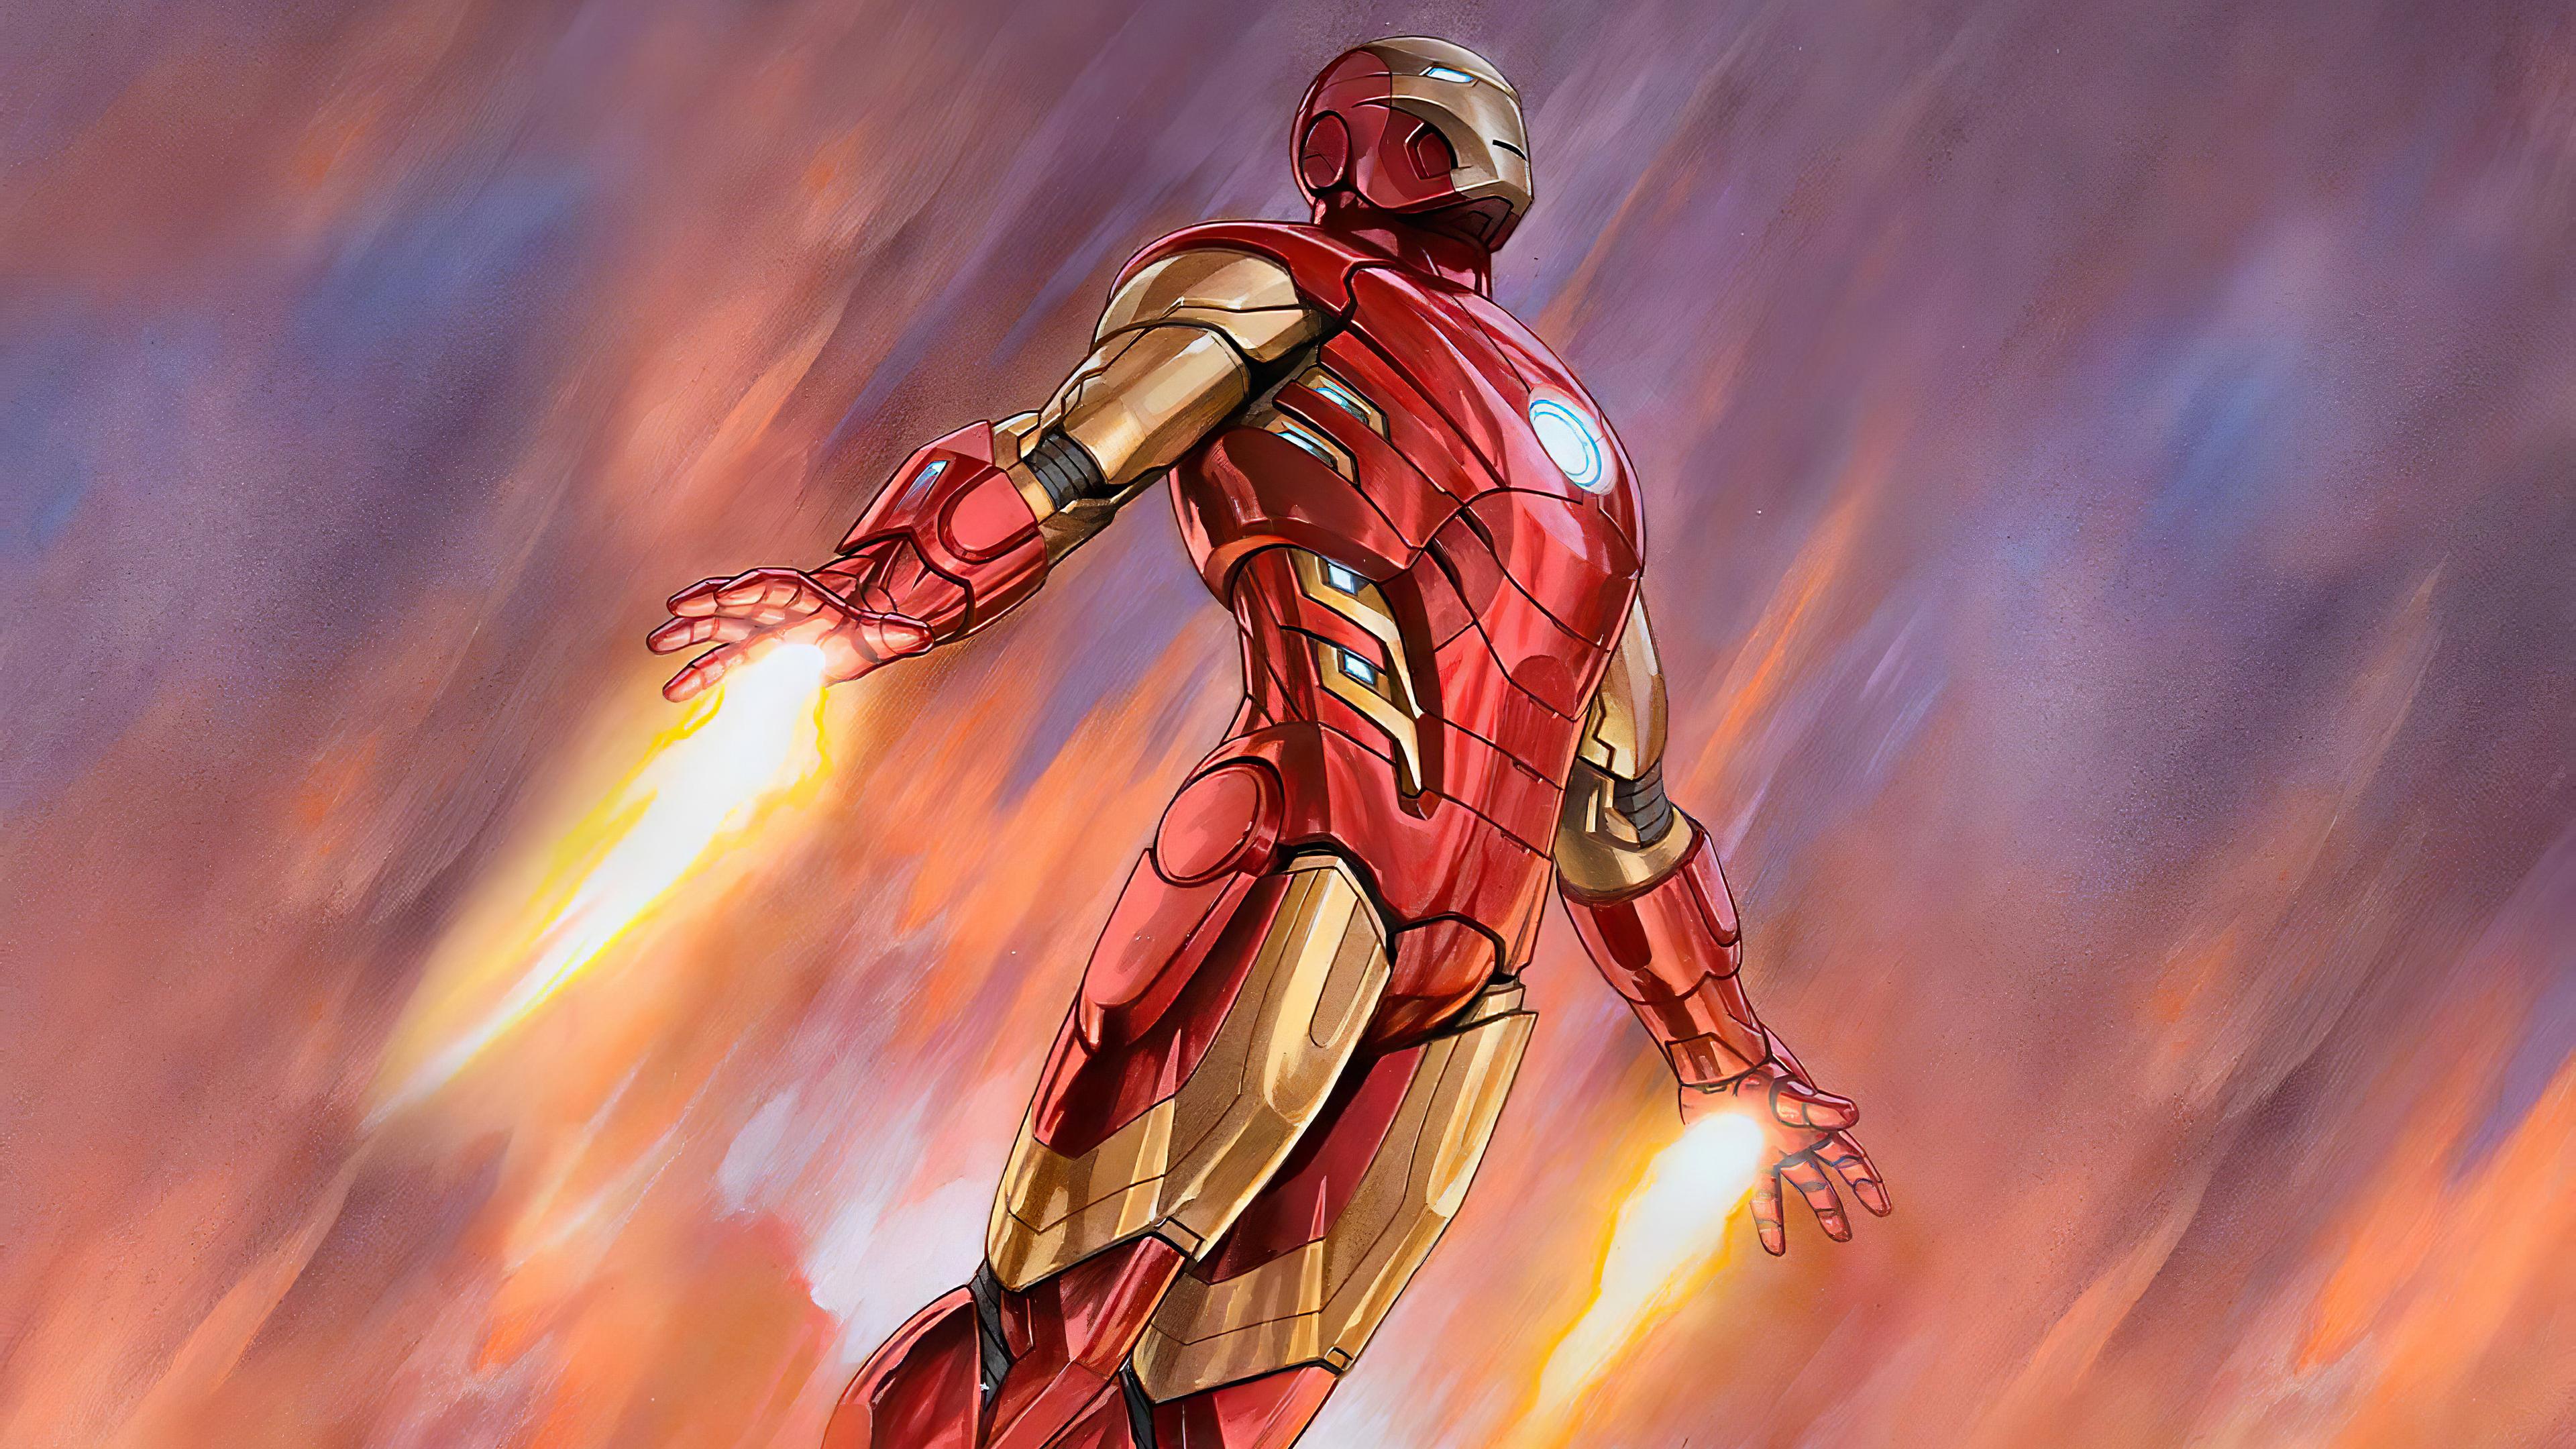 iron man fly 1572367707 - Iron Man Fly - superheroes wallpapers, iron man wallpapers, hd-wallpapers, digital art wallpapers, artwork wallpapers, 4k-wallpapers